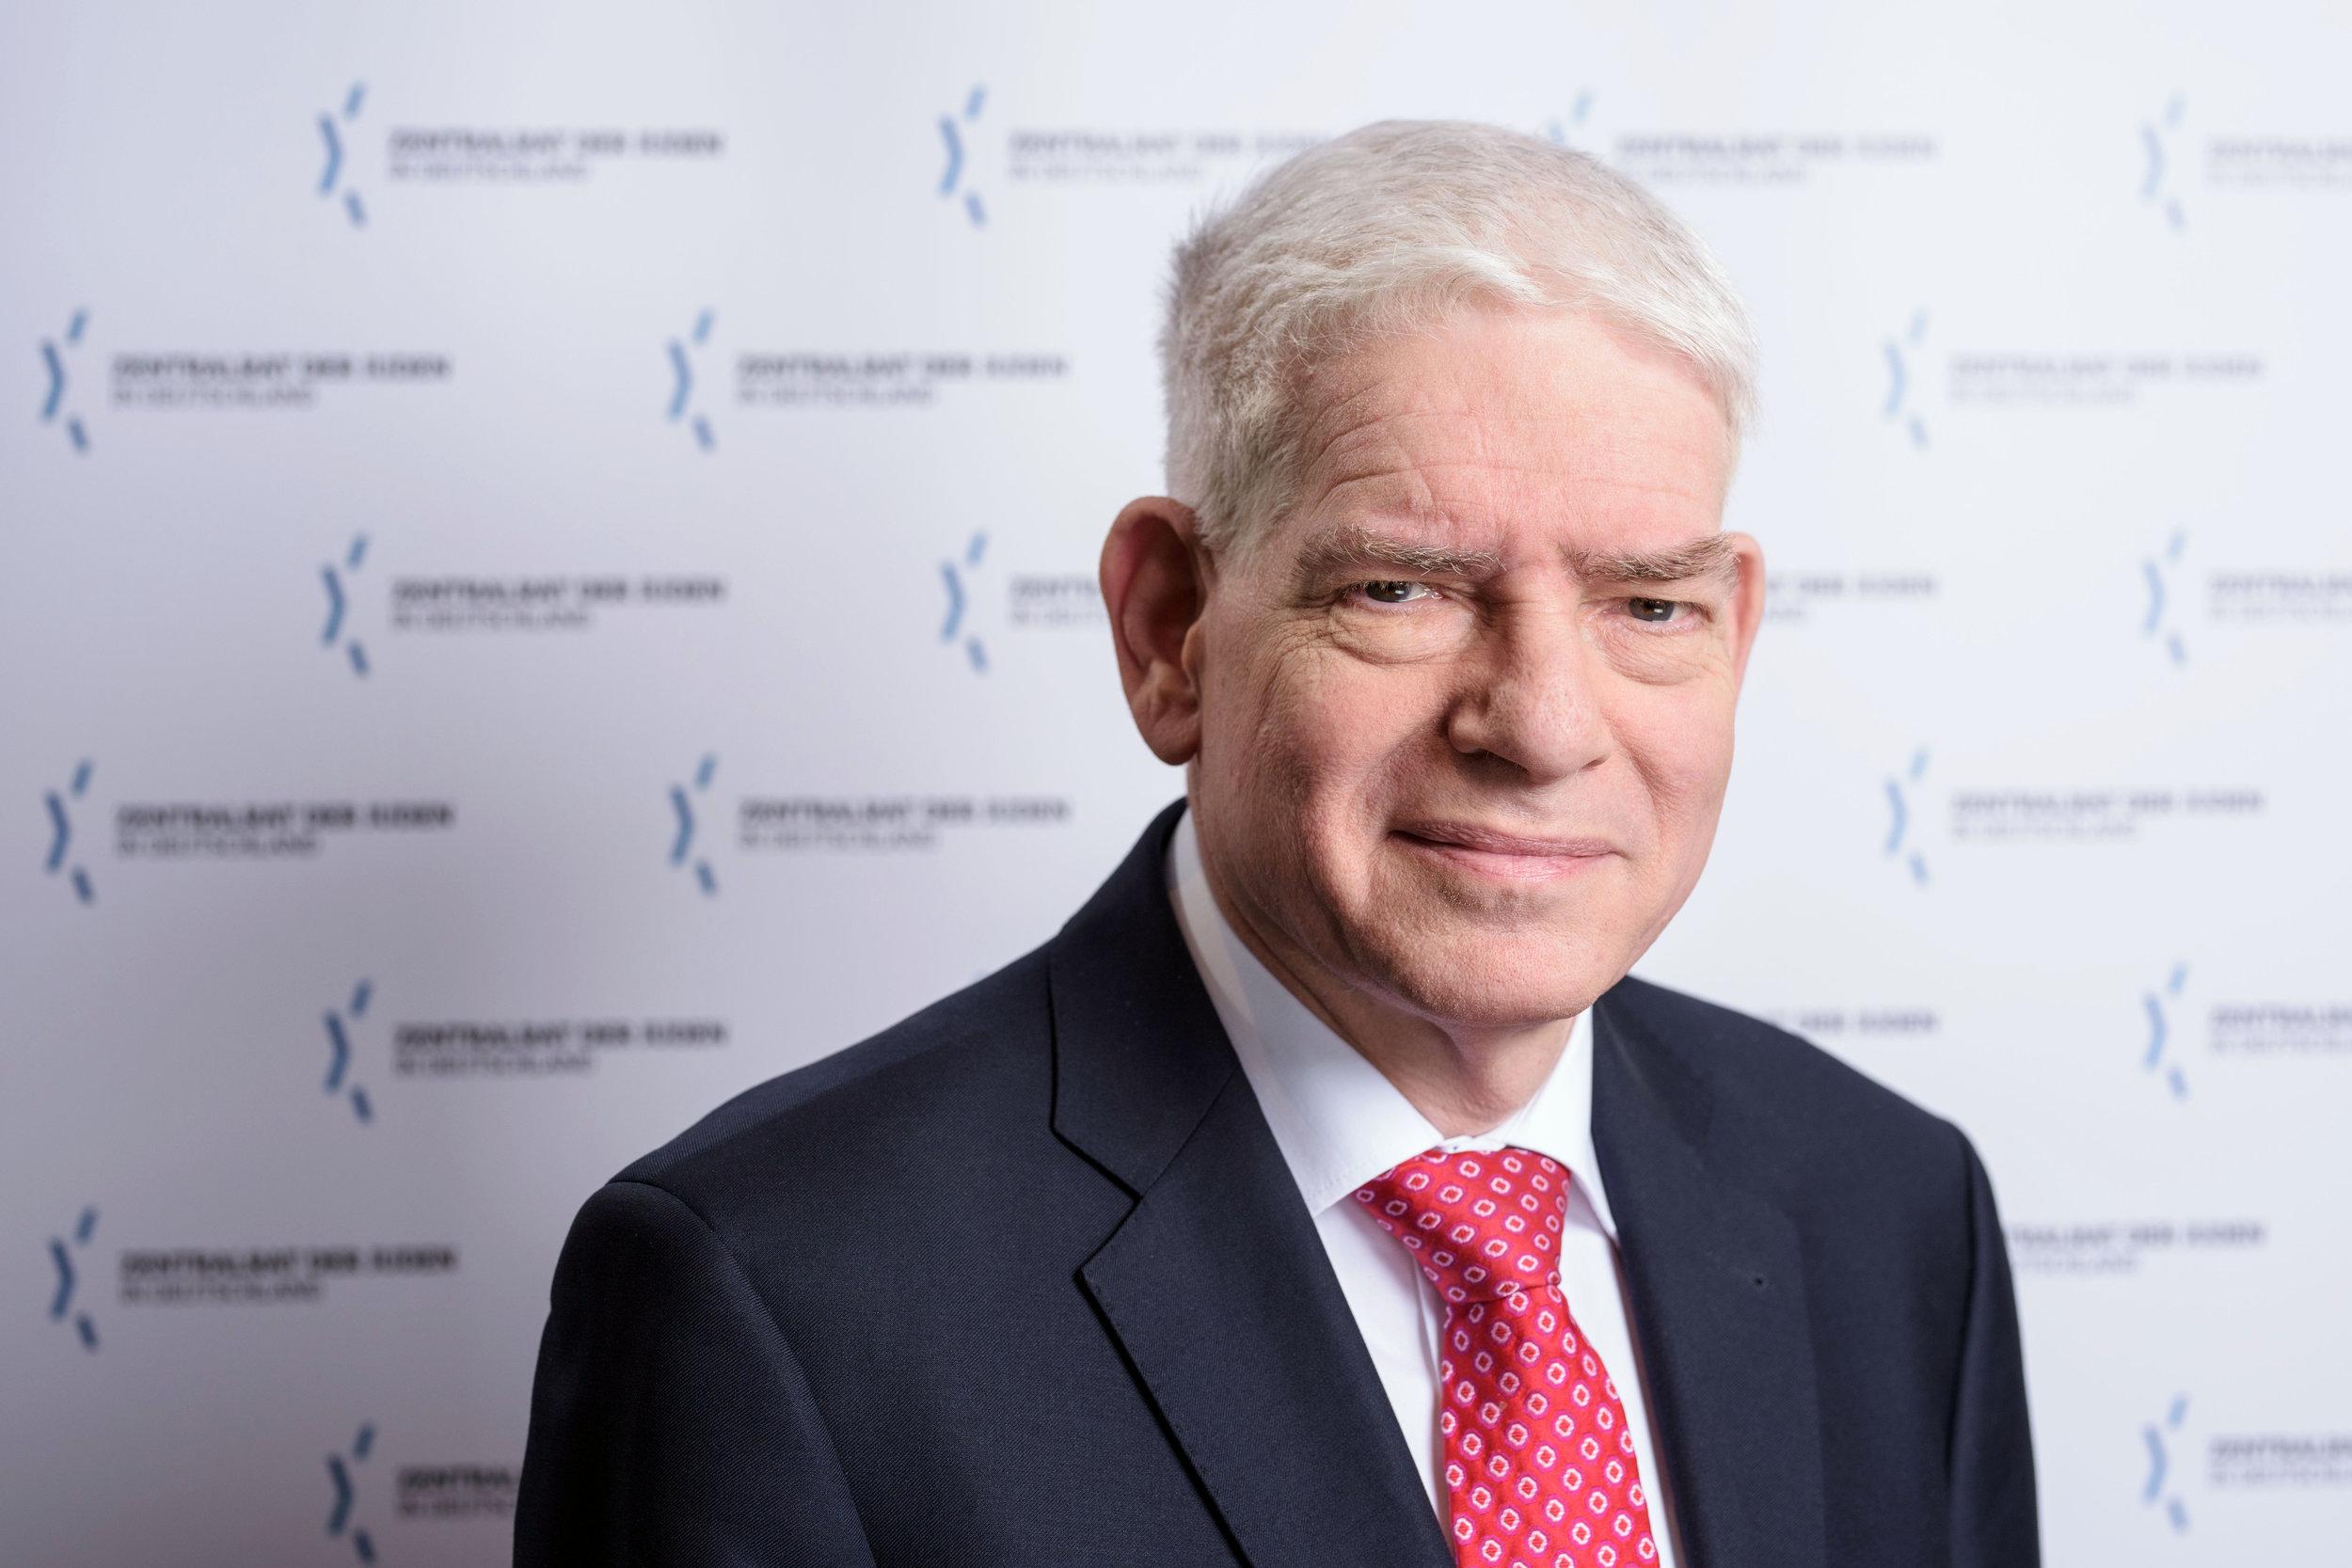 Dr. JOSEF SCHUSTER